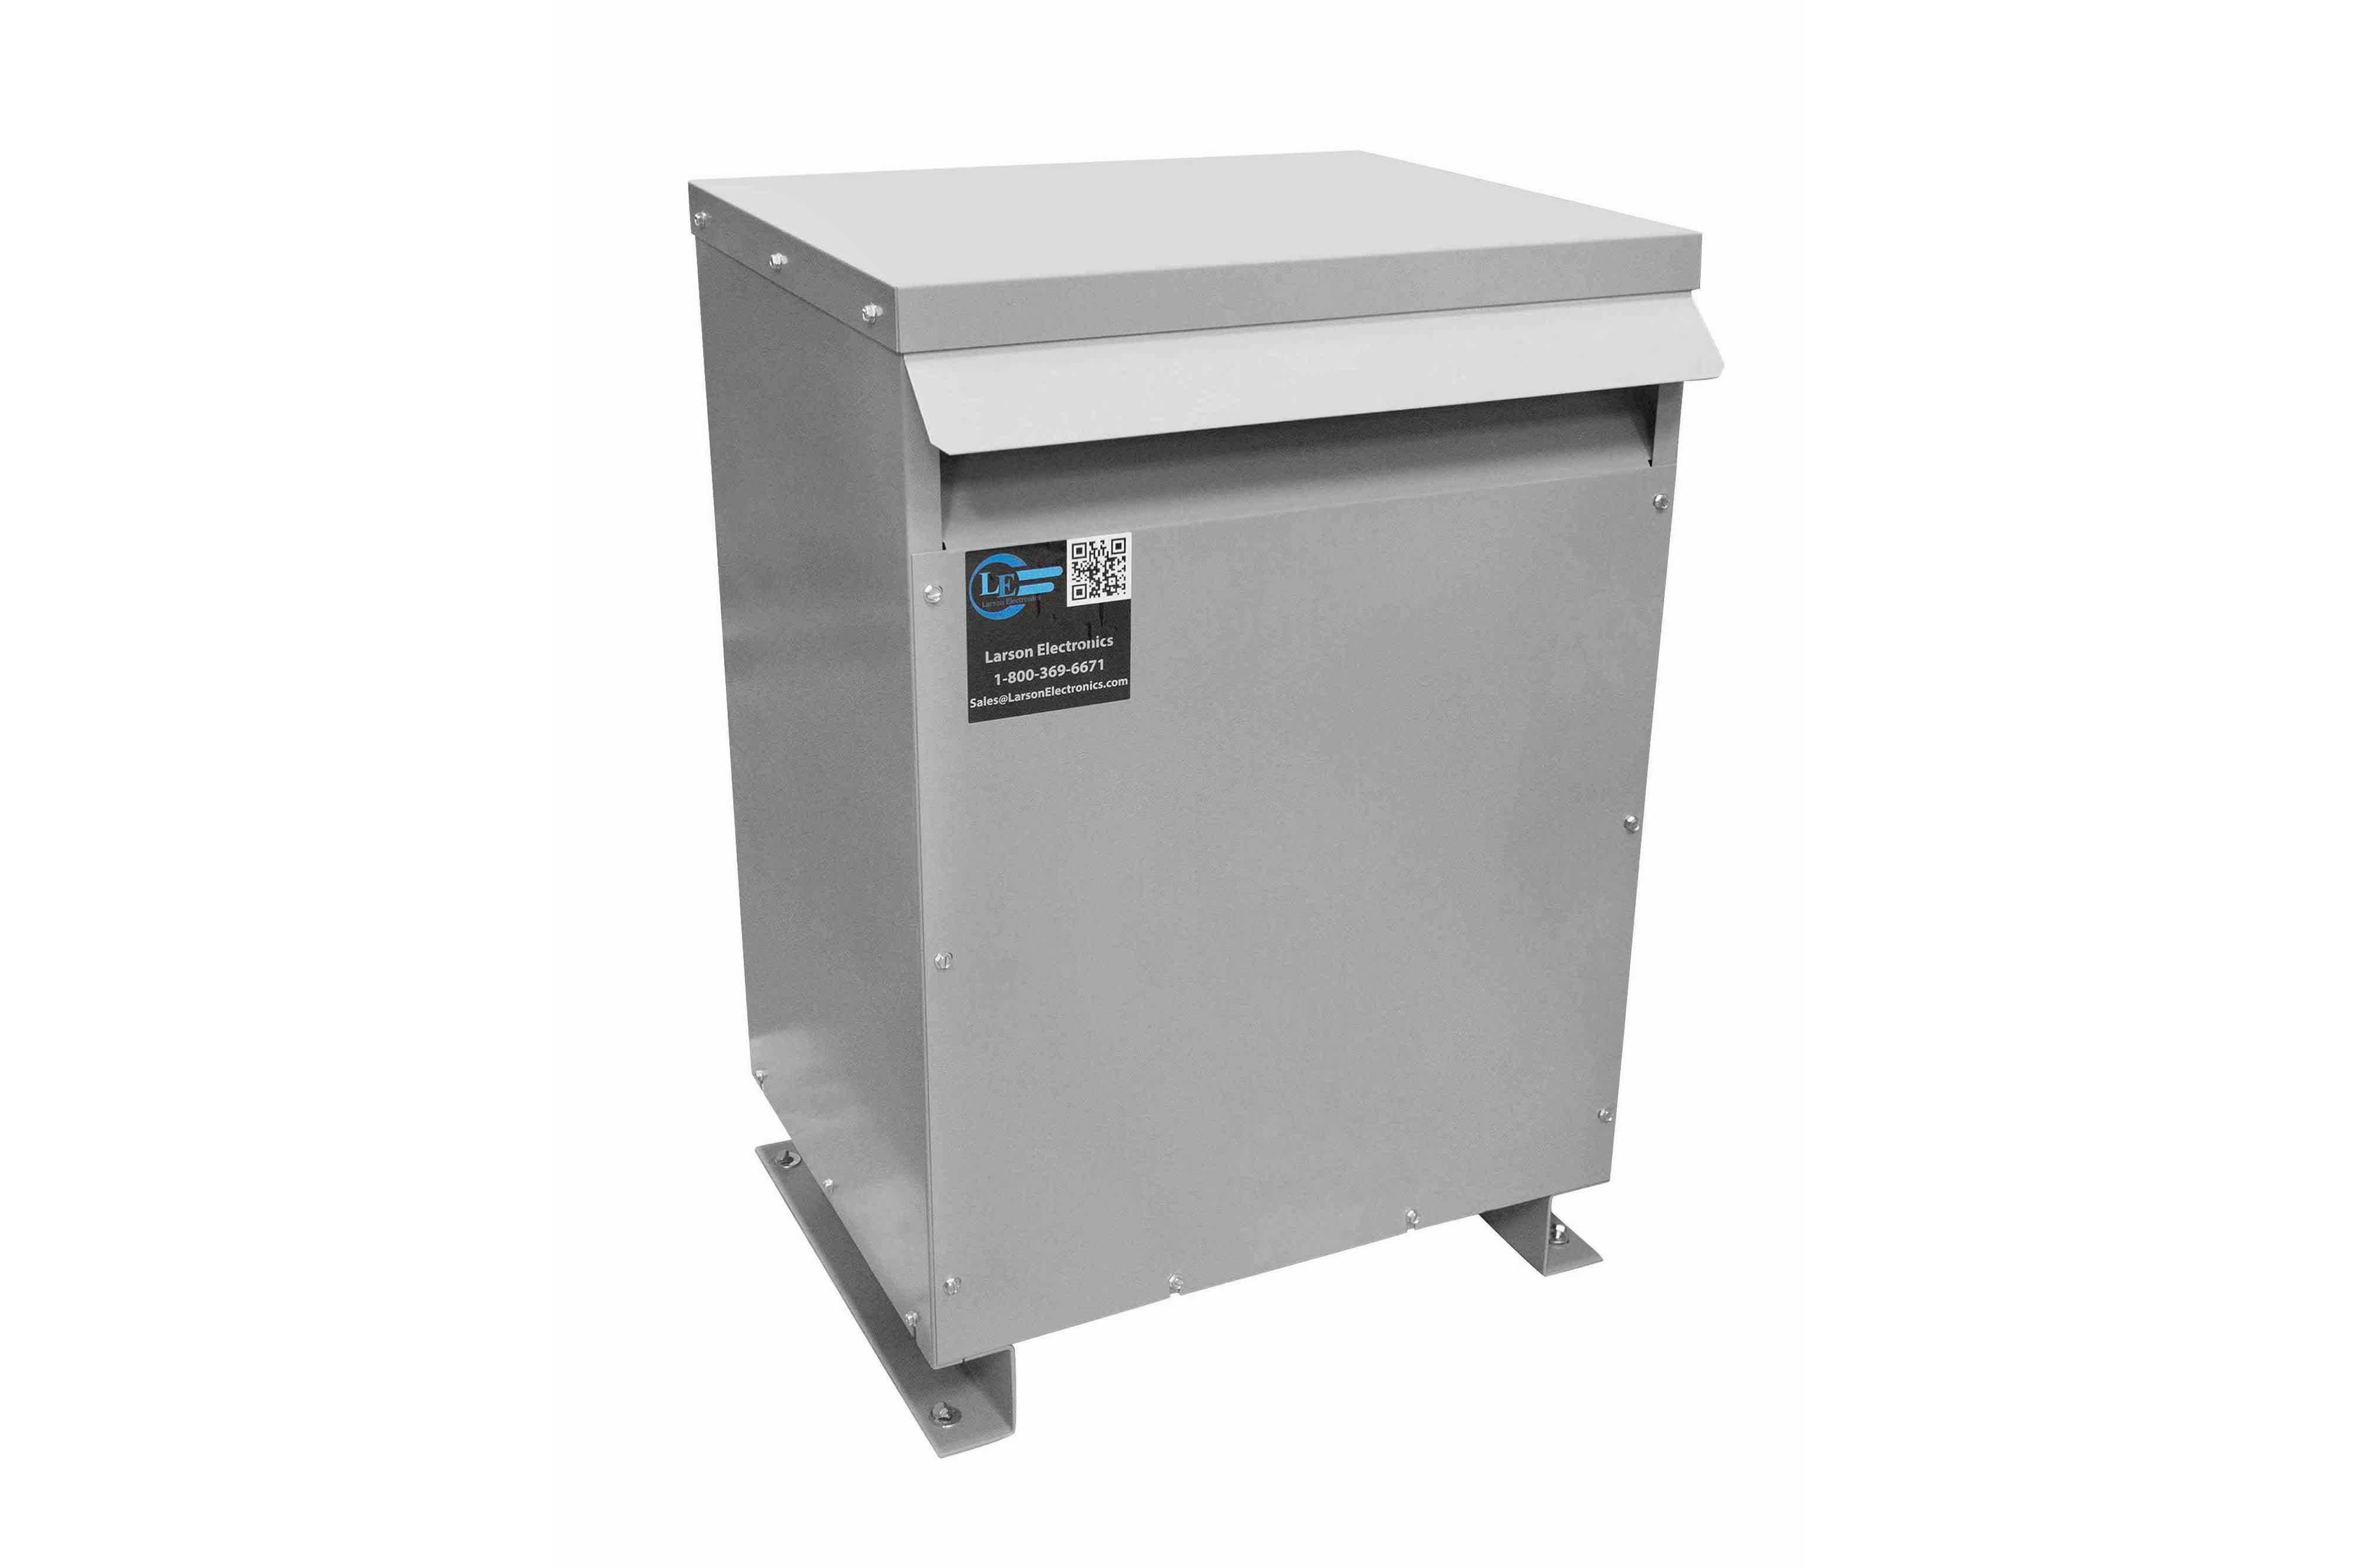 11 kVA 3PH Isolation Transformer, 460V Wye Primary, 208V Delta Secondary, N3R, Ventilated, 60 Hz